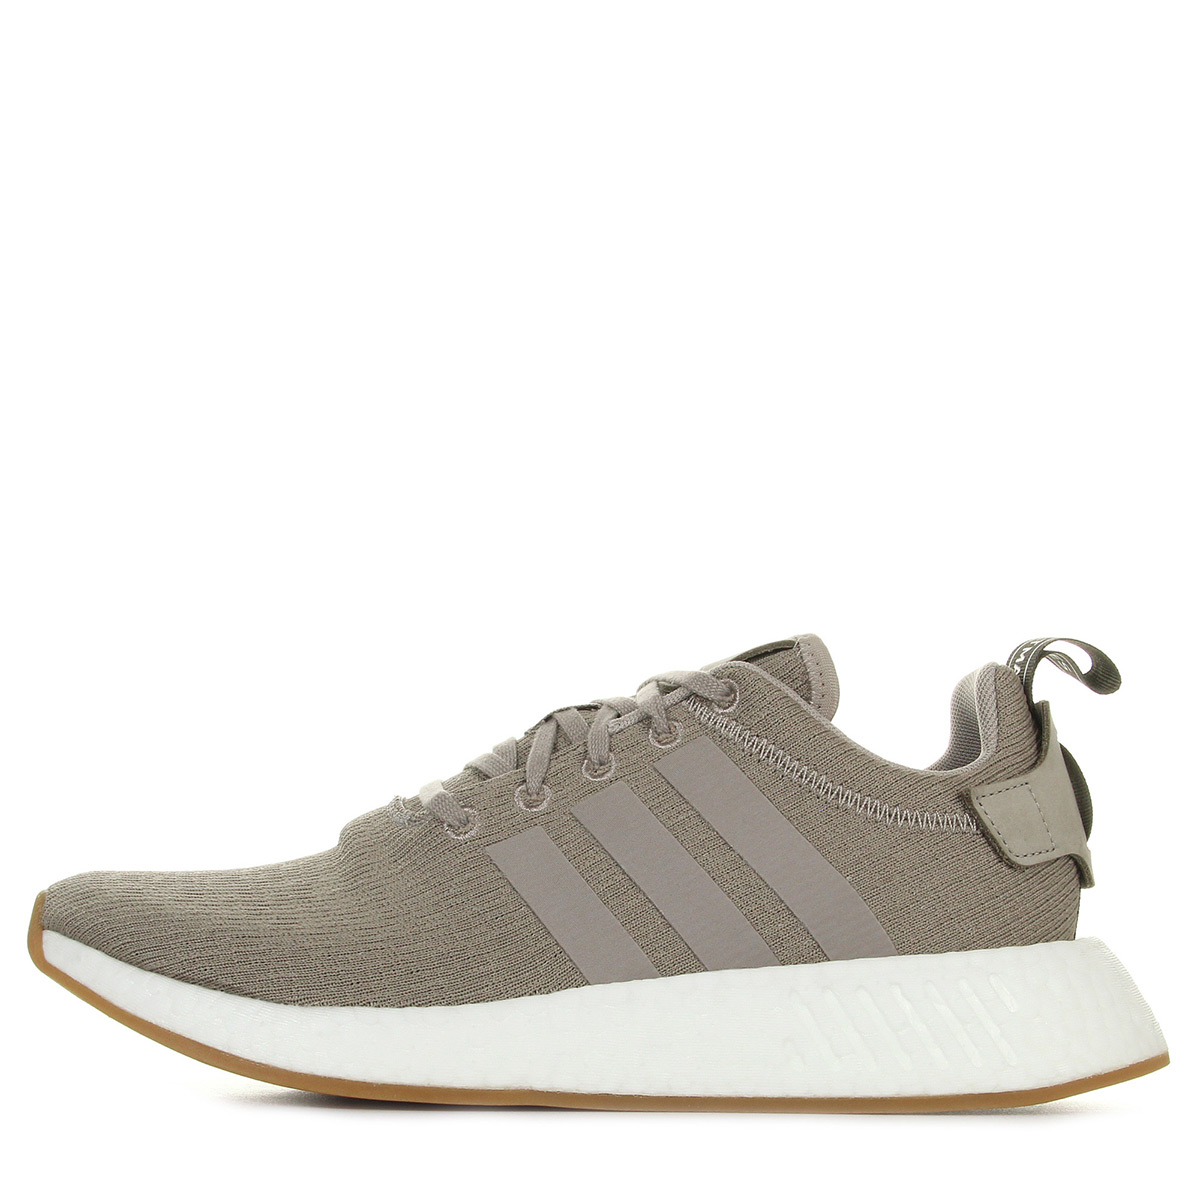 Détails sur Chaussures Baskets adidas homme Nmd R2 taille Beige Cuir Lacets